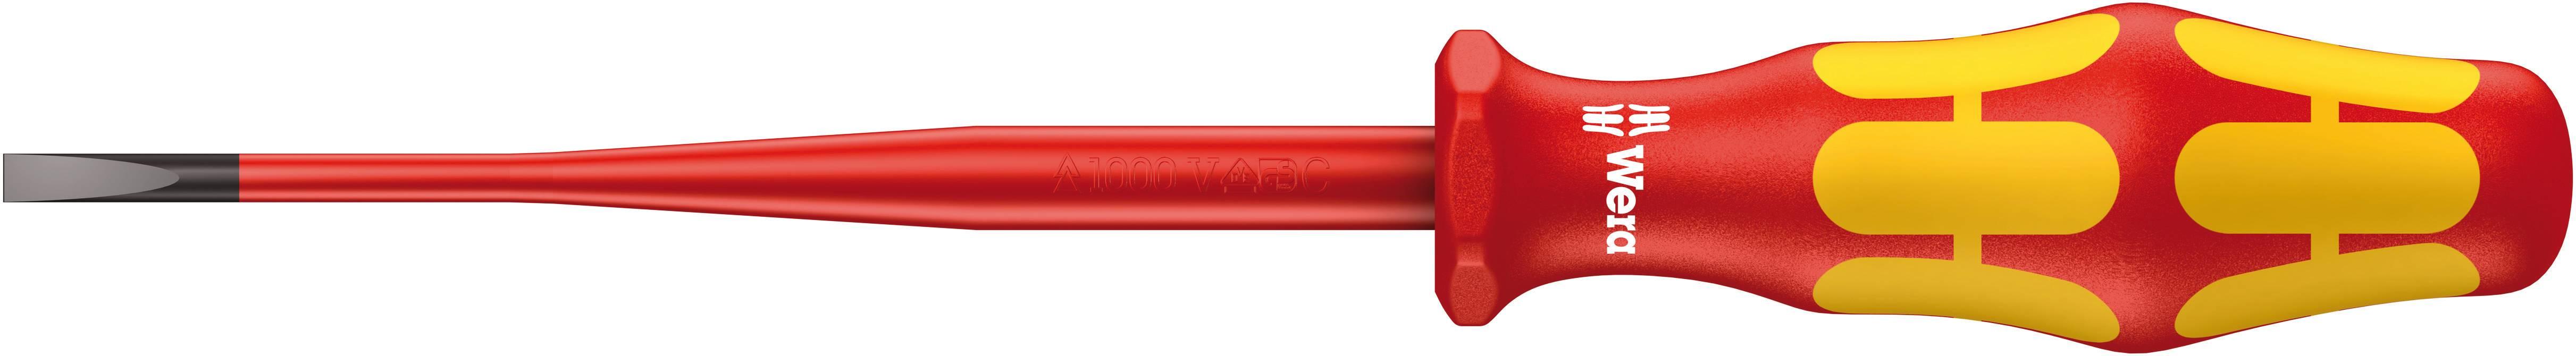 Plochý šroubovák Wera VDE 5,5 x 125 mm